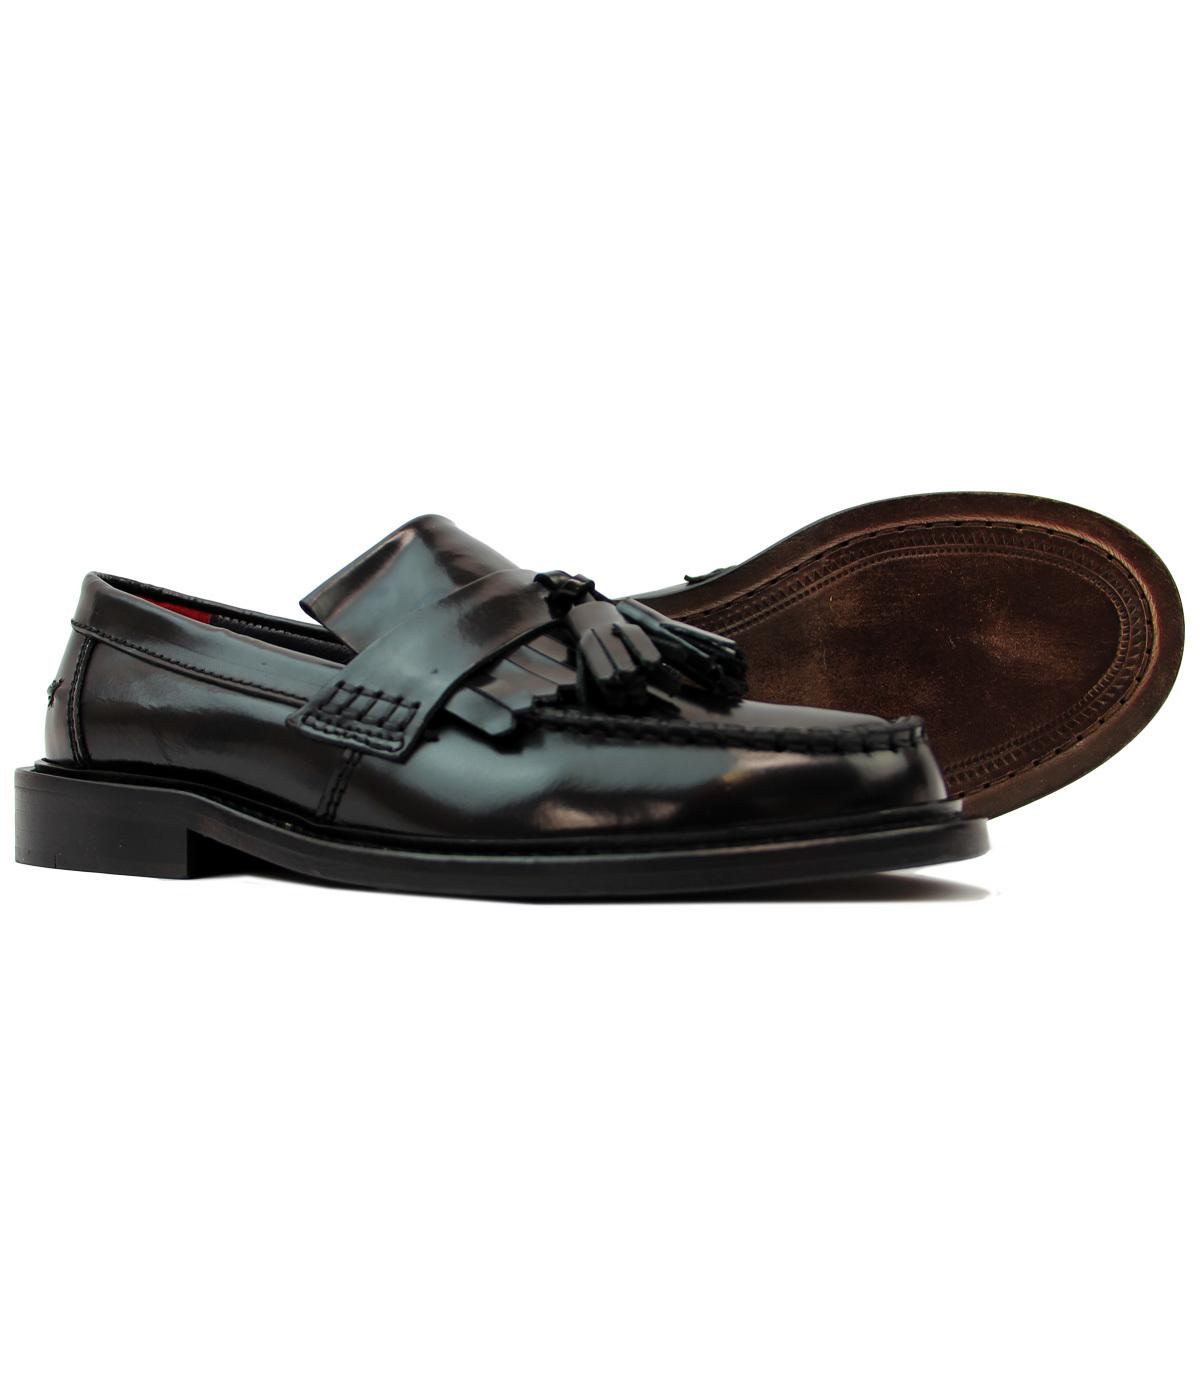 18c4655f799 DELICIOUS JUNCTION Rudegirl Womens 60s Mod Loafers in Black